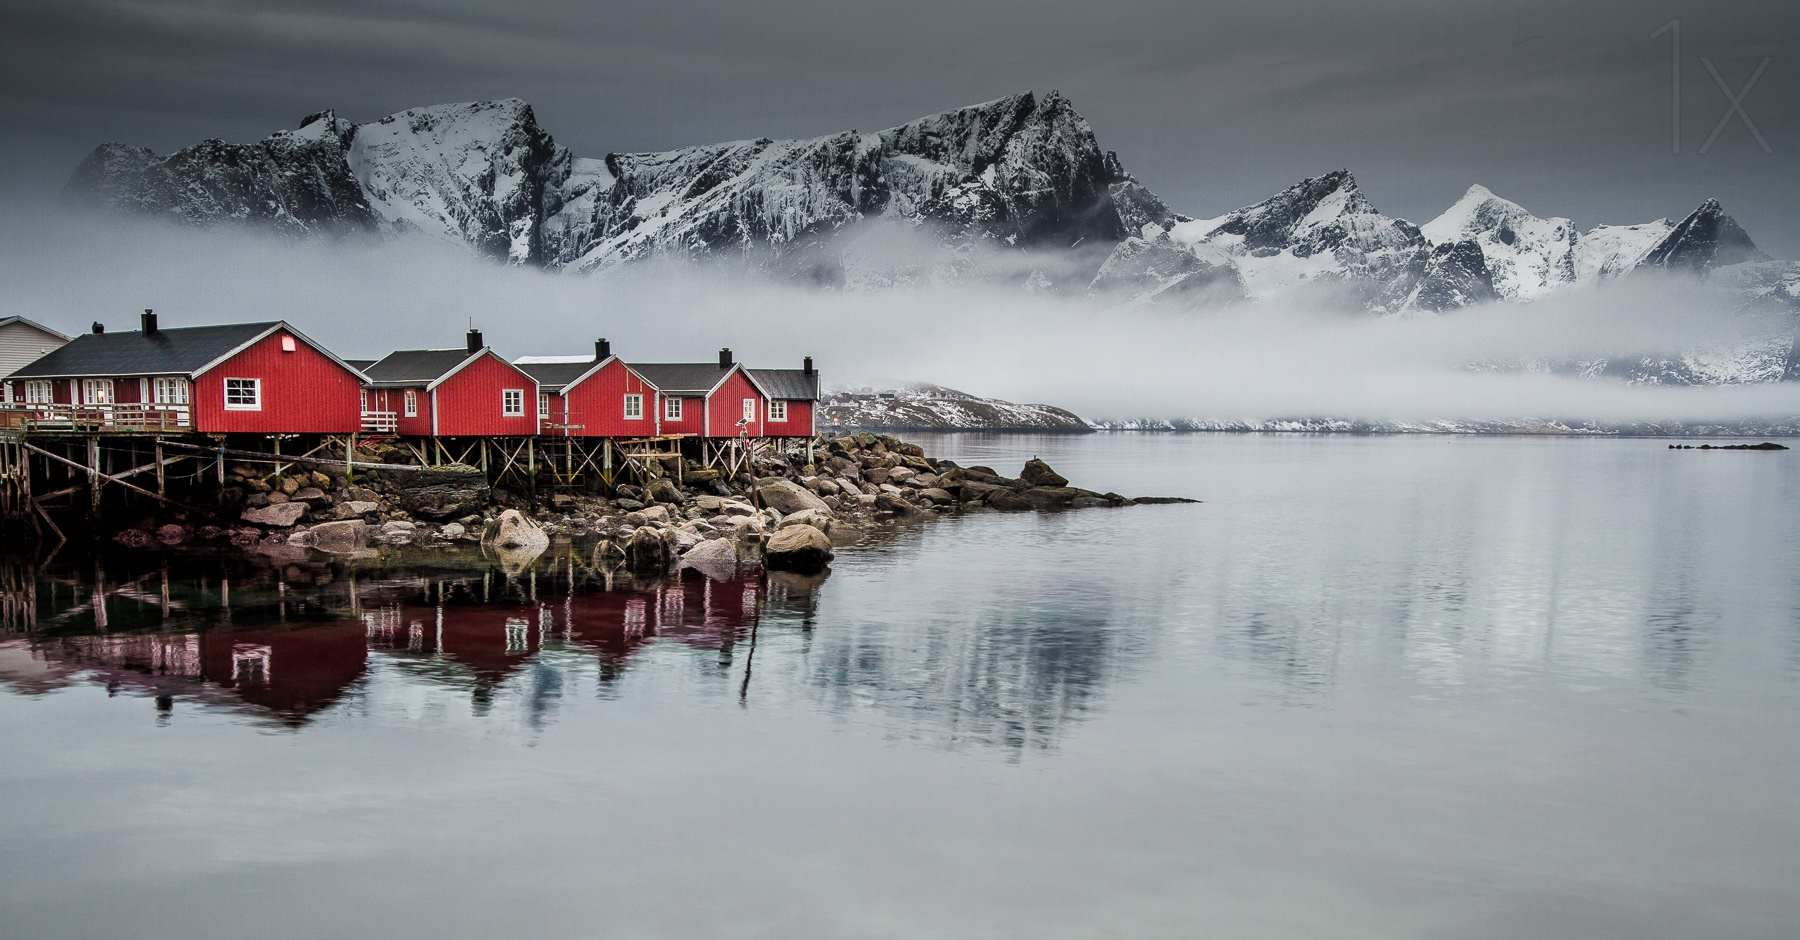 Beautiful Landscape Photography By Lior Yaakobi